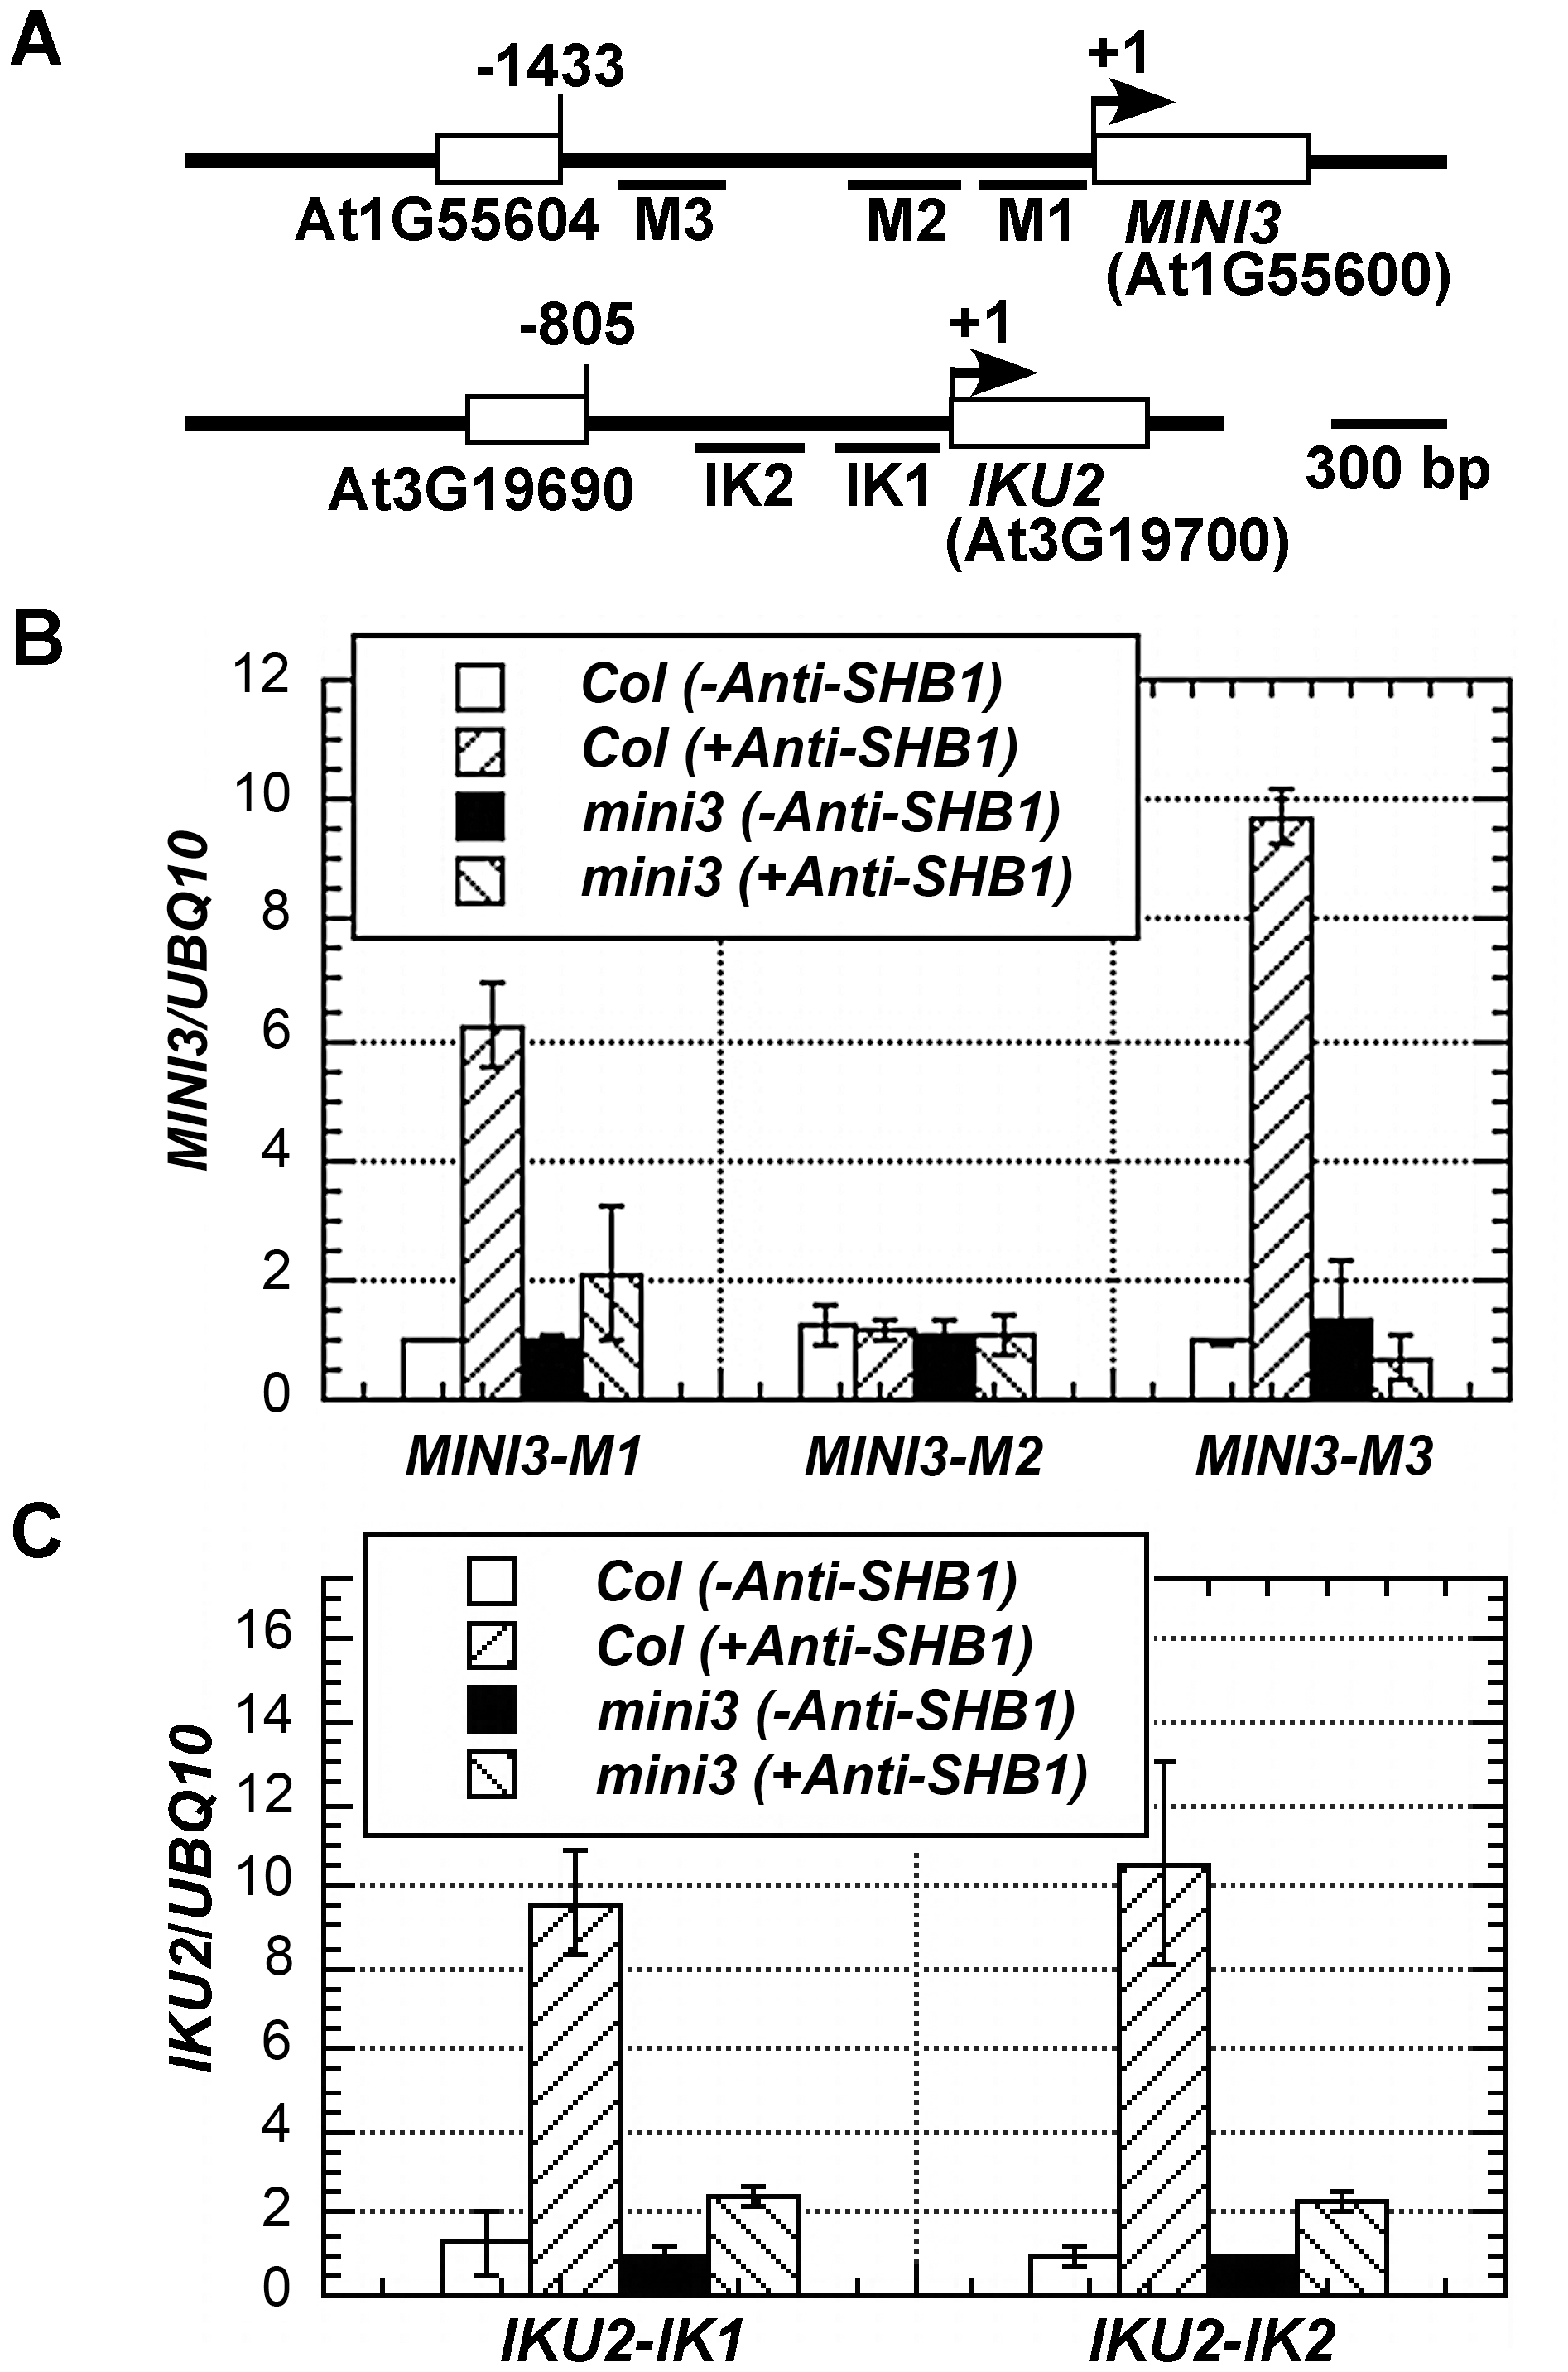 Association of SHB1 with <i>MINI3</i> and <i>IKU2</i> promoters requires MINI3.